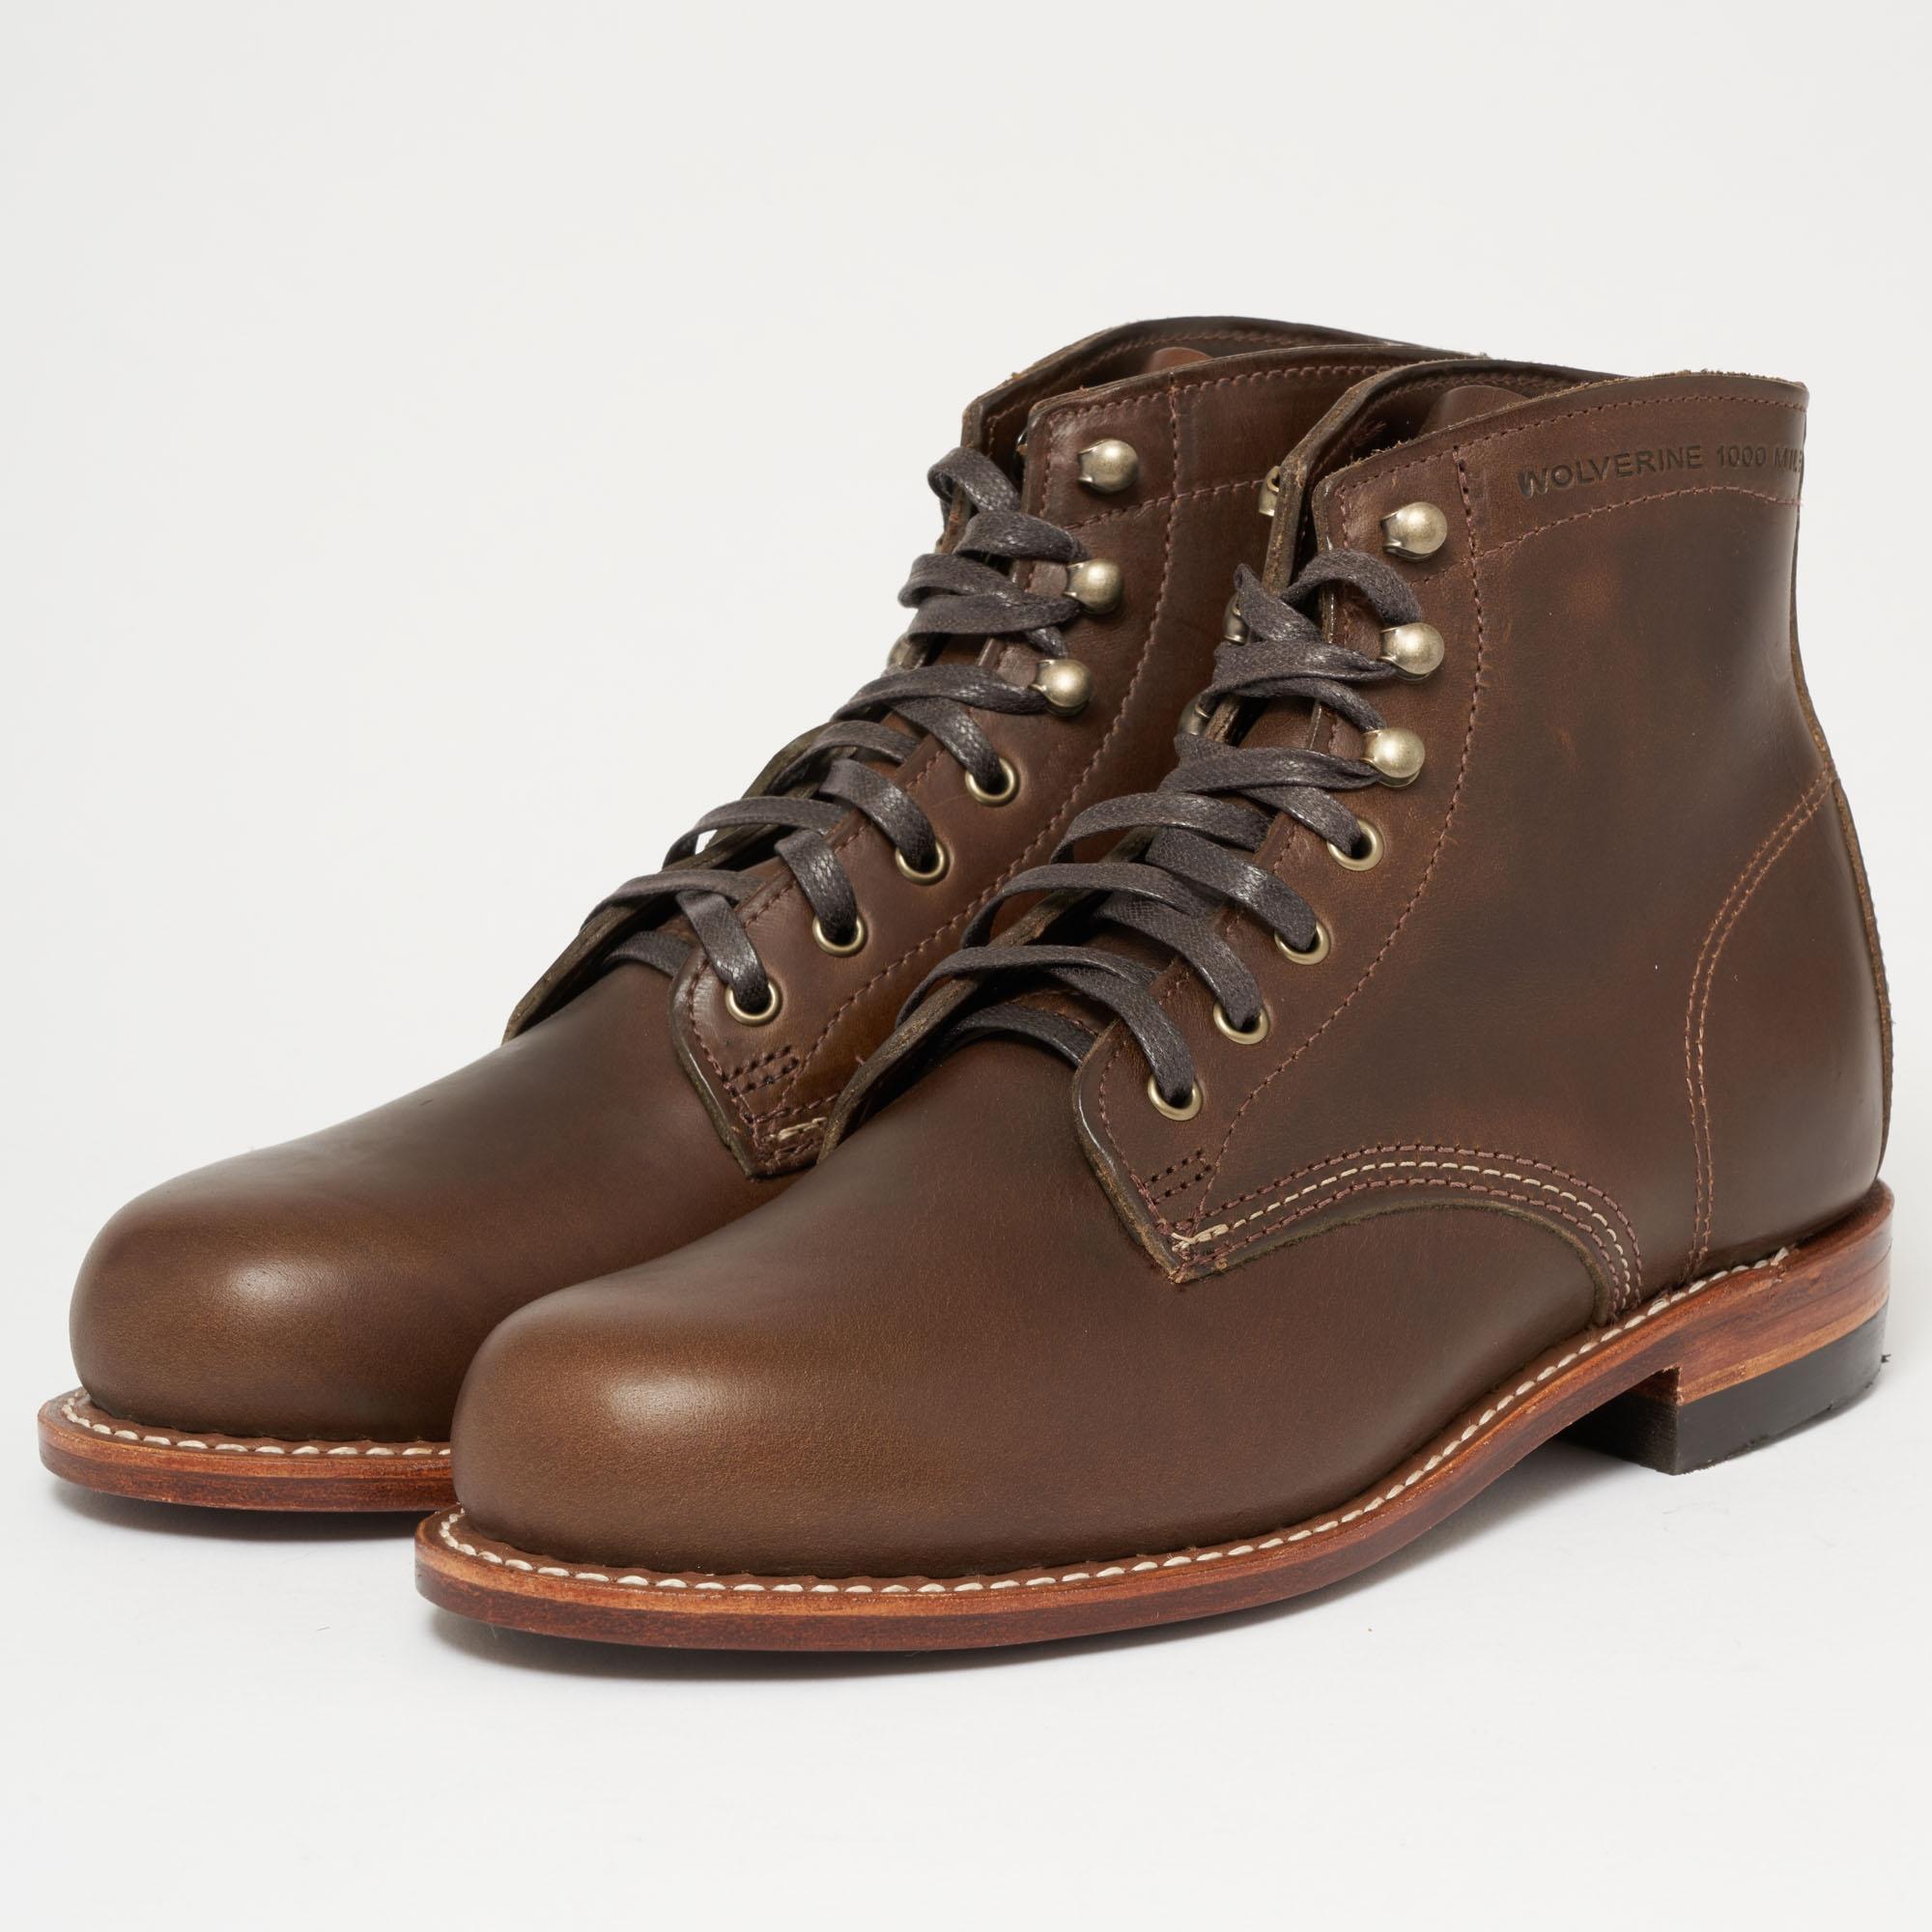 cba74ceb687 Men's Original 1000 Mile Boot - Olive Brown